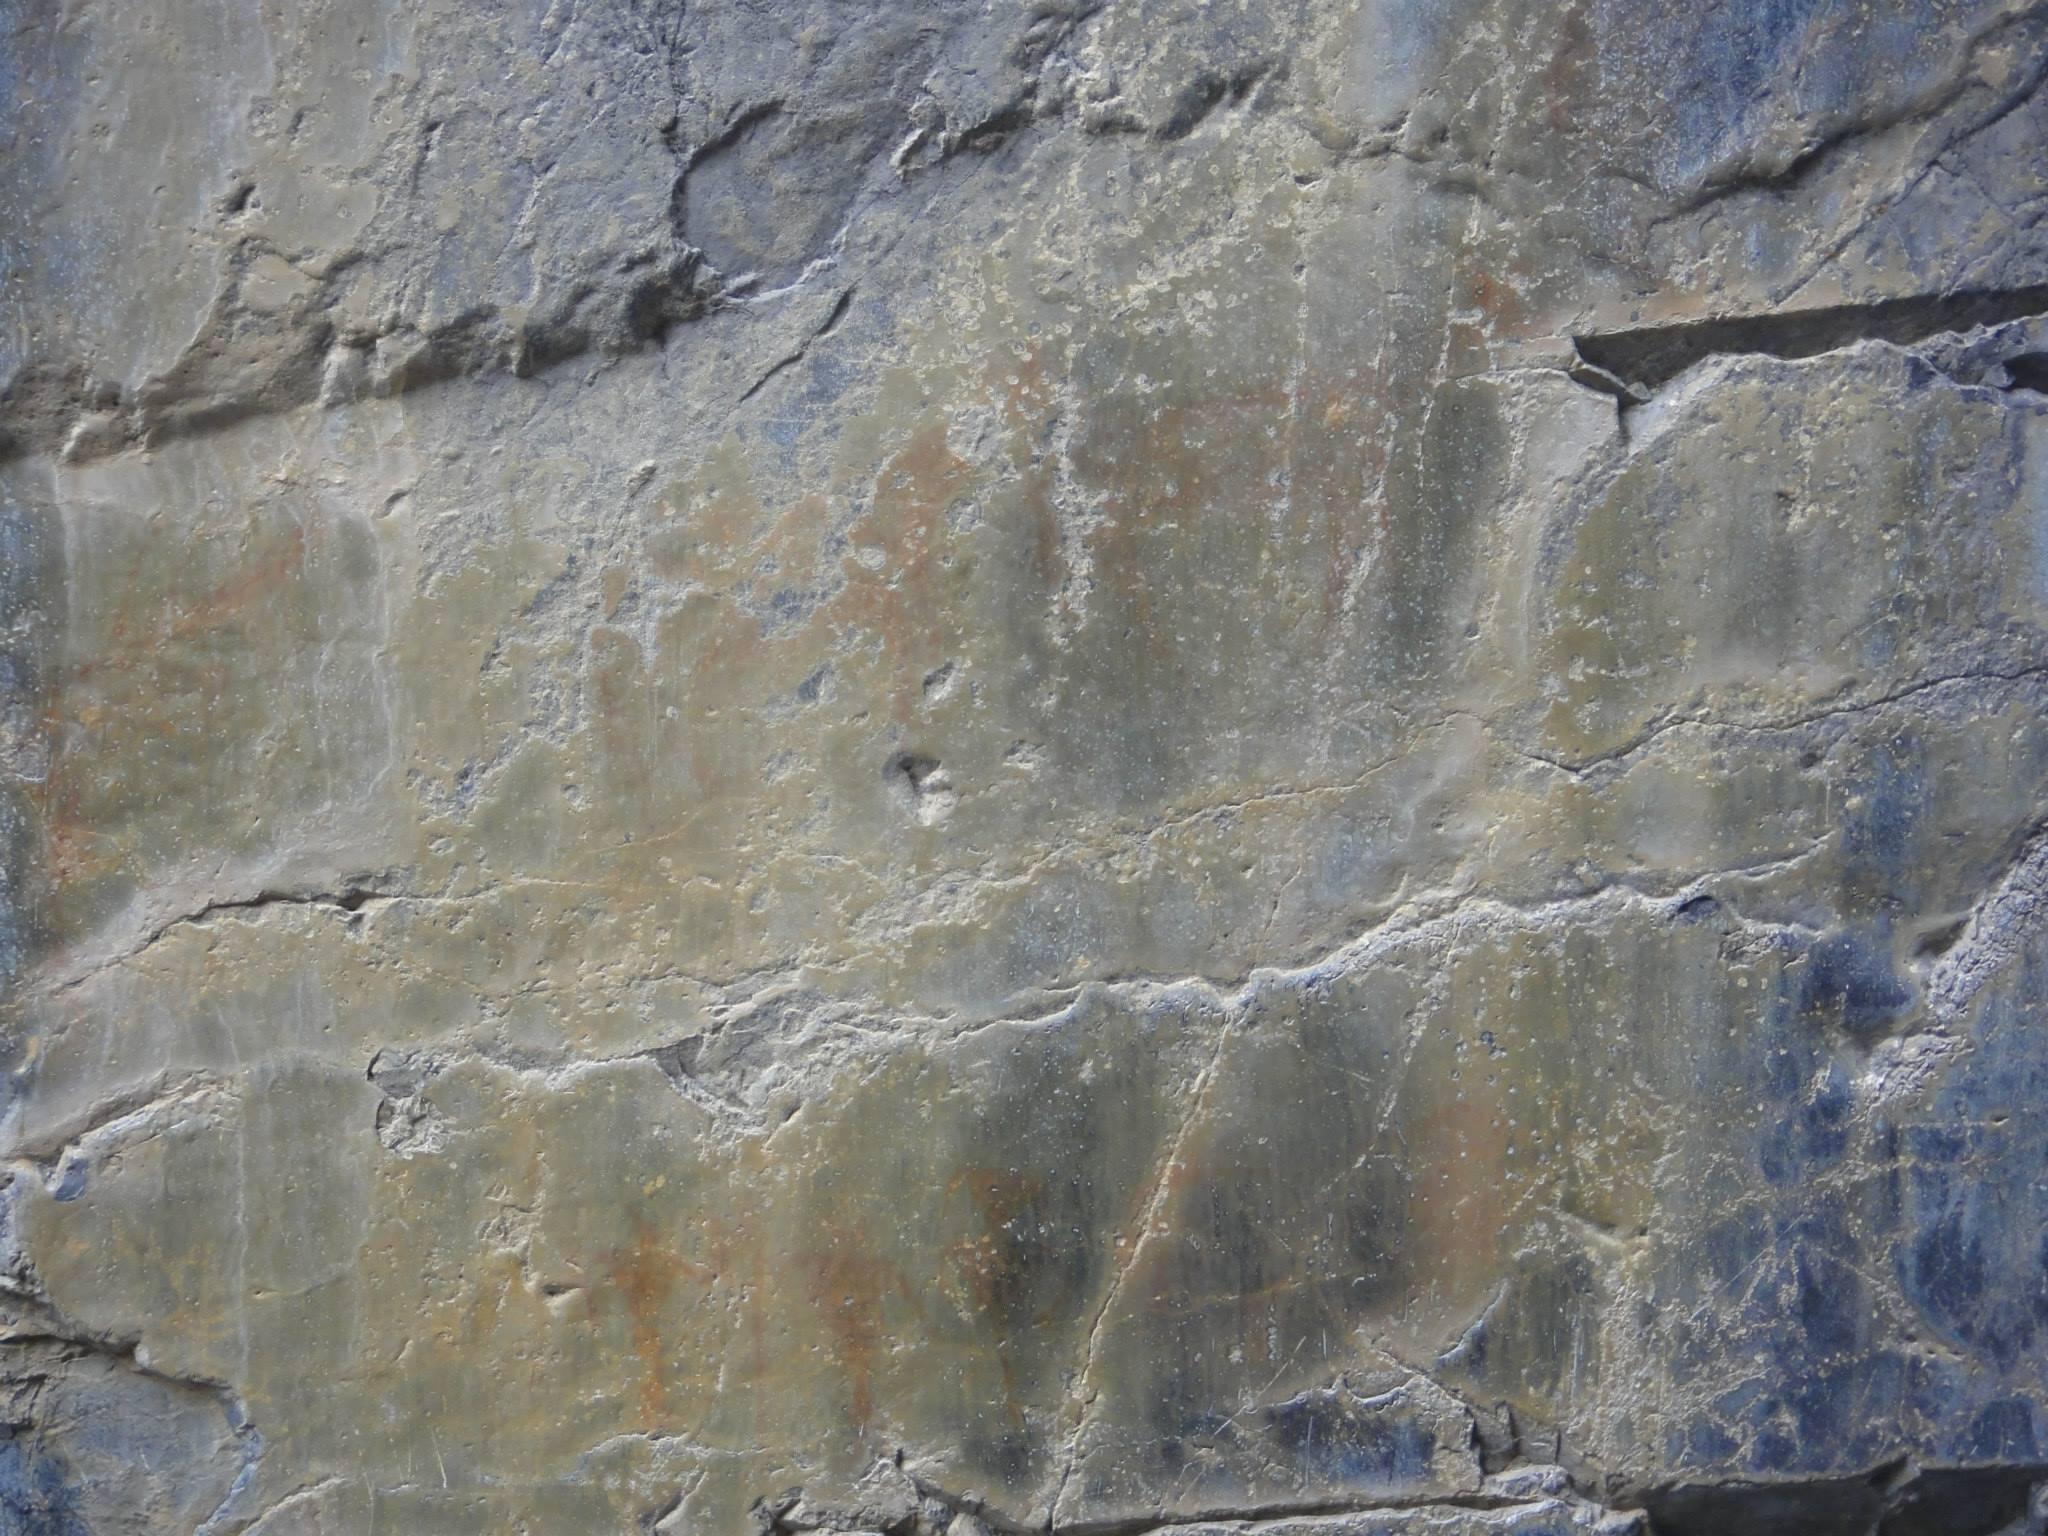 003 - Grotto Canyon